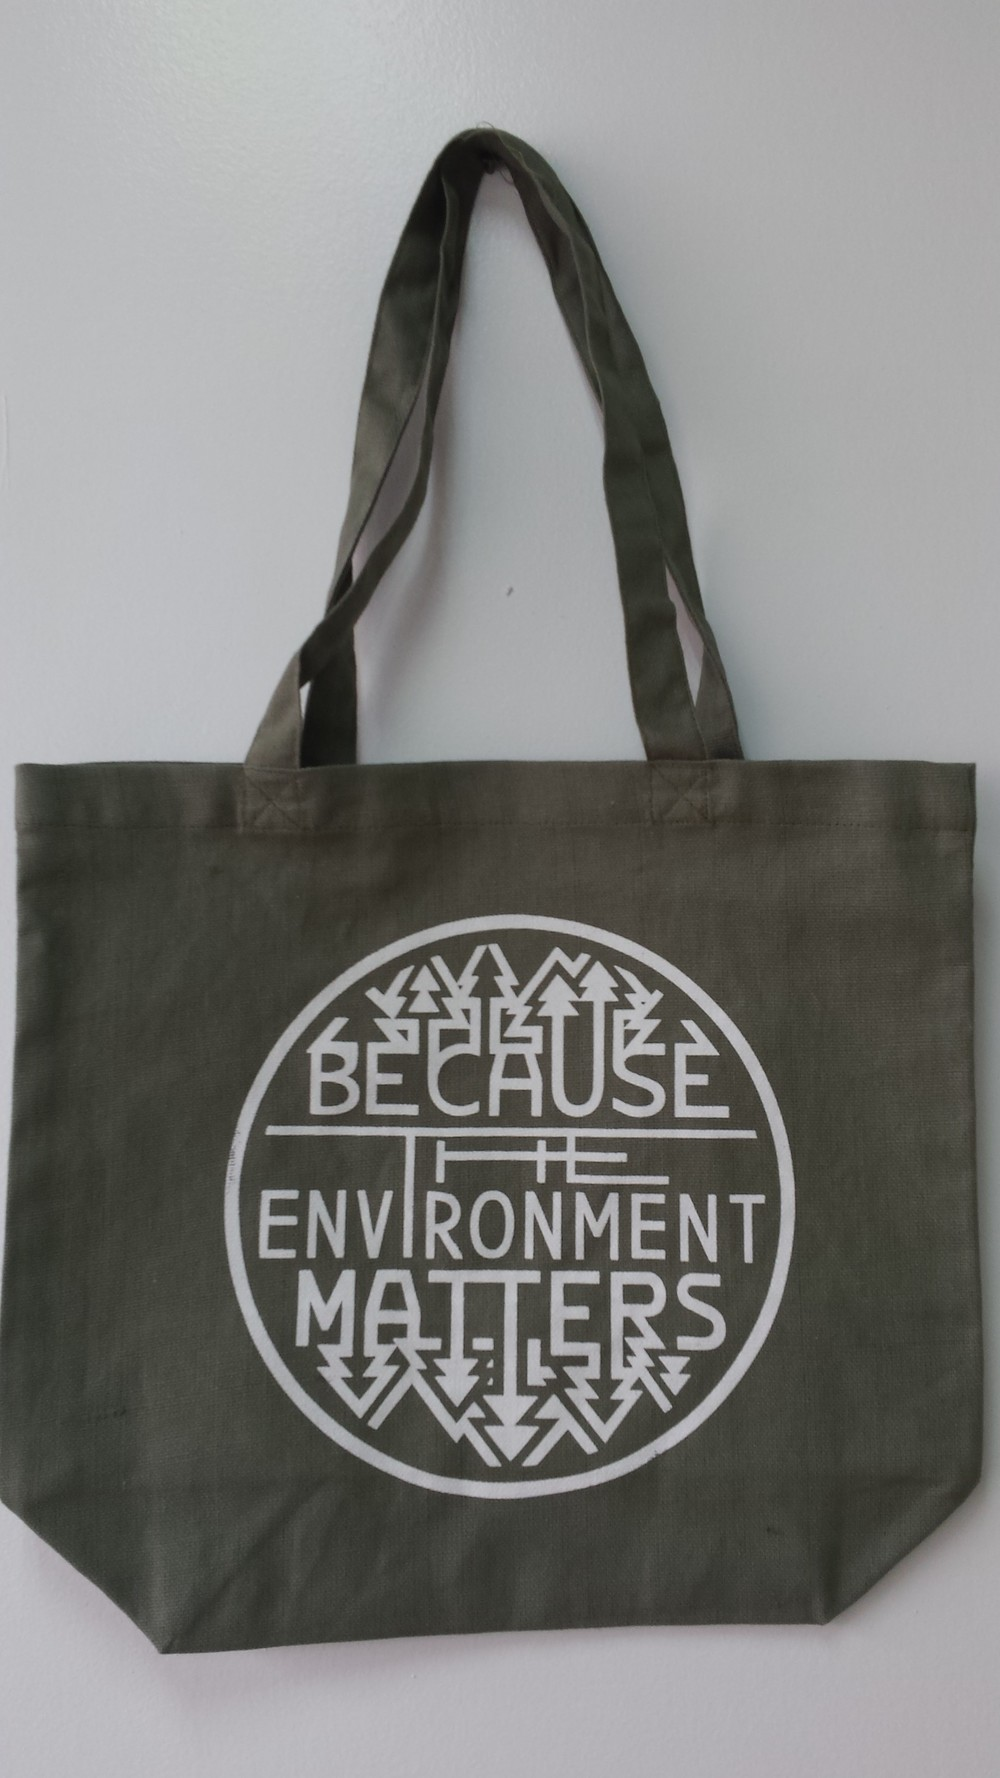 Rid Plastic Bags - Go Reusable Bags